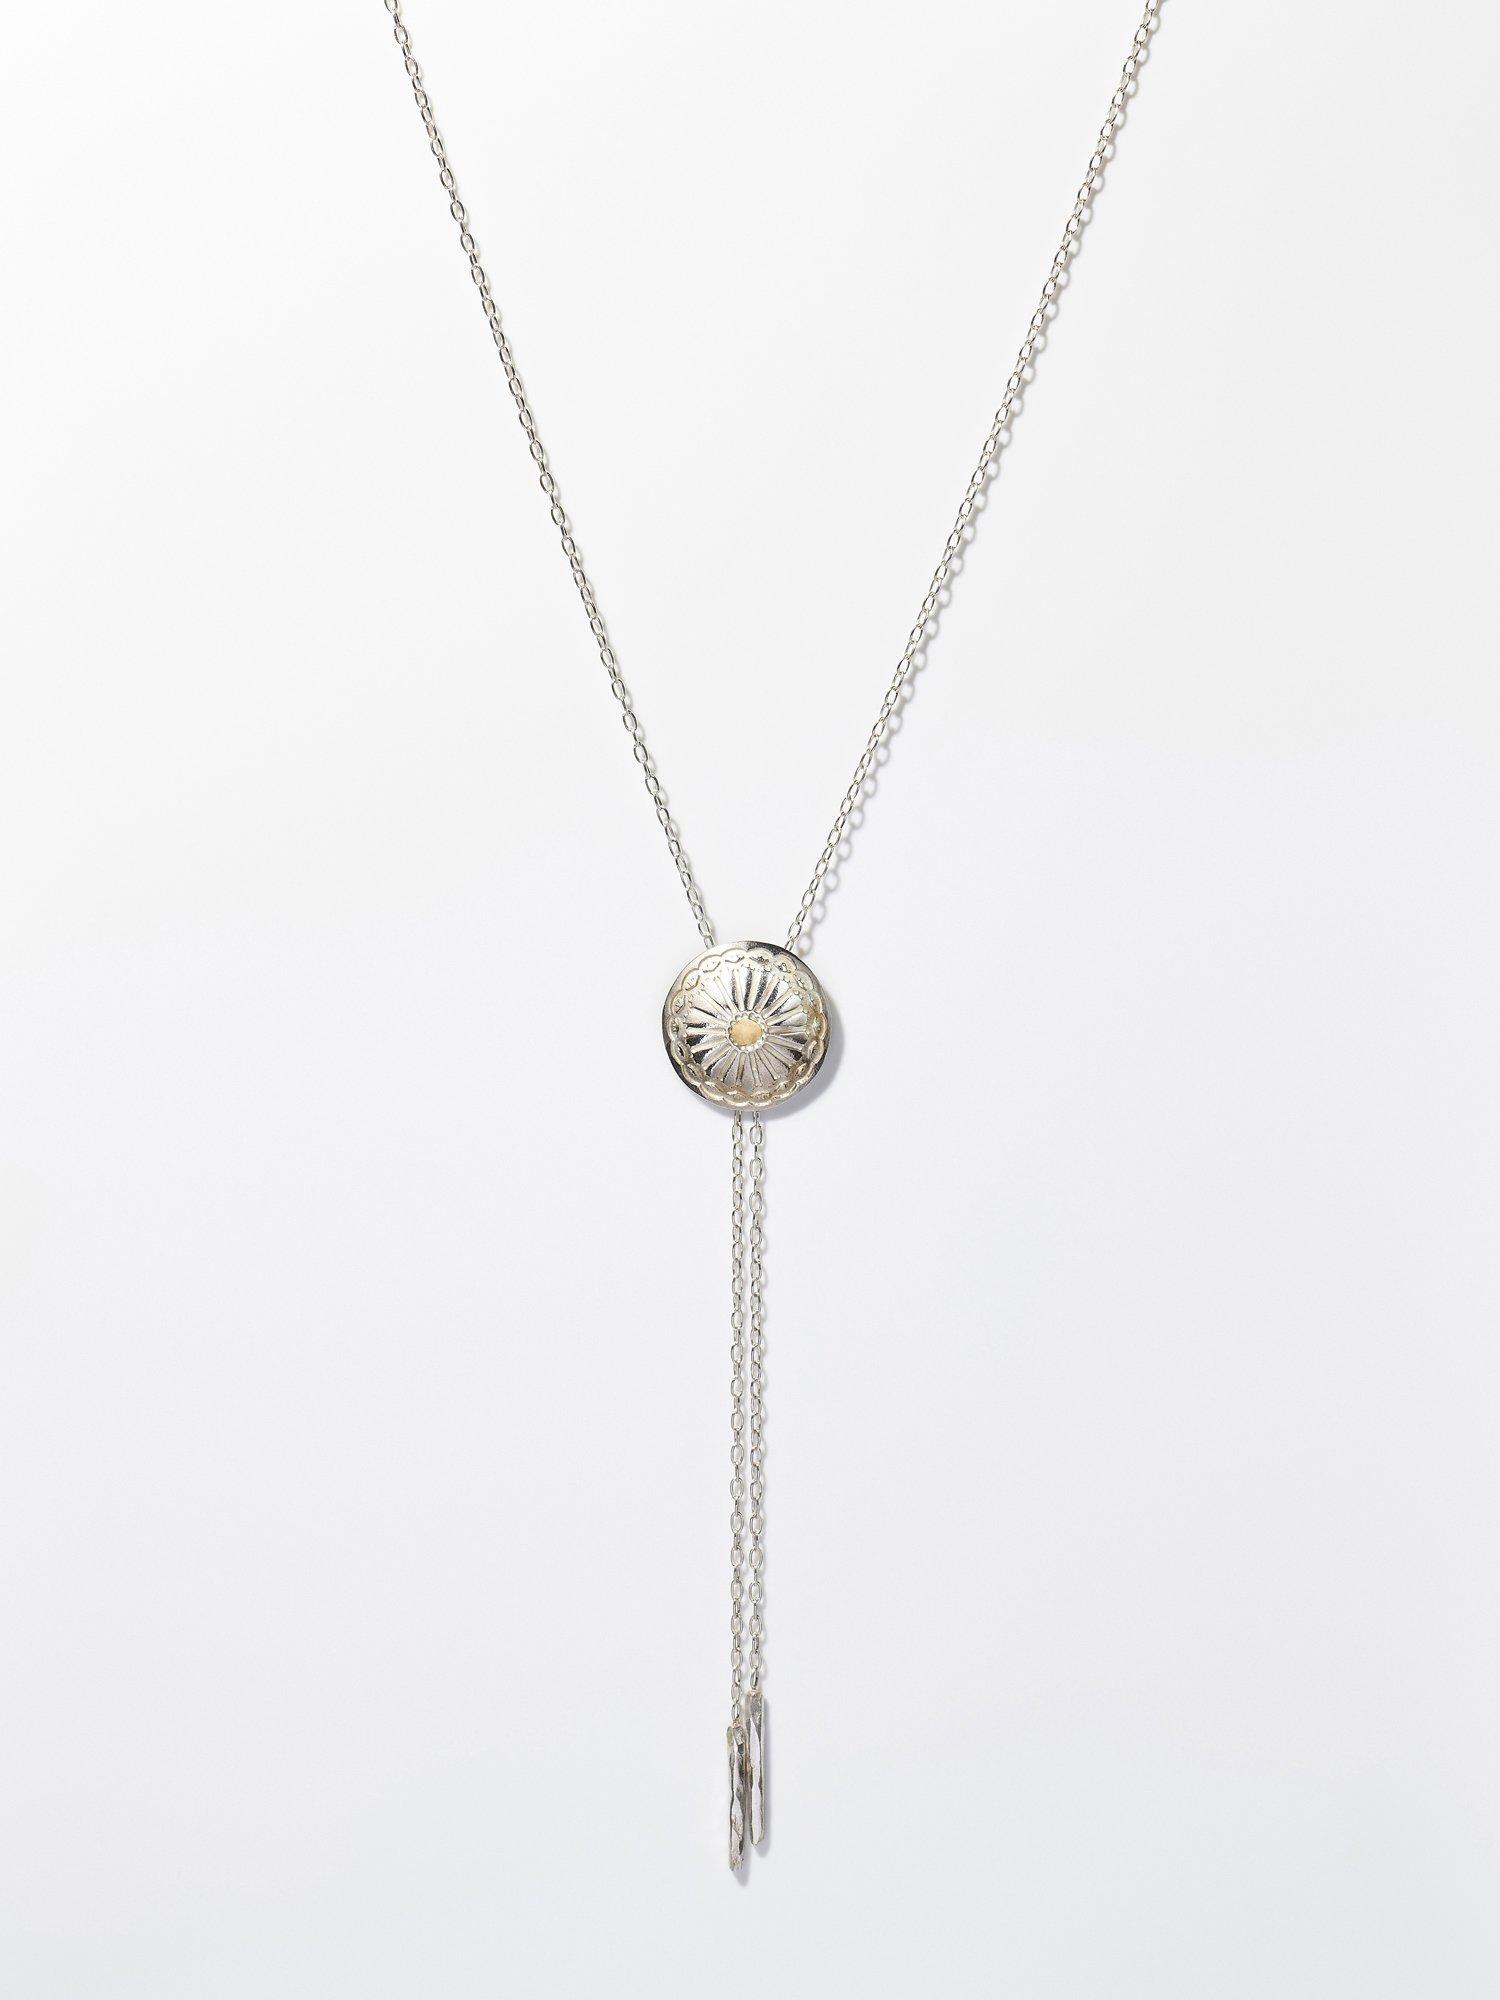 ARTEMIS / Artemis concho loop tie